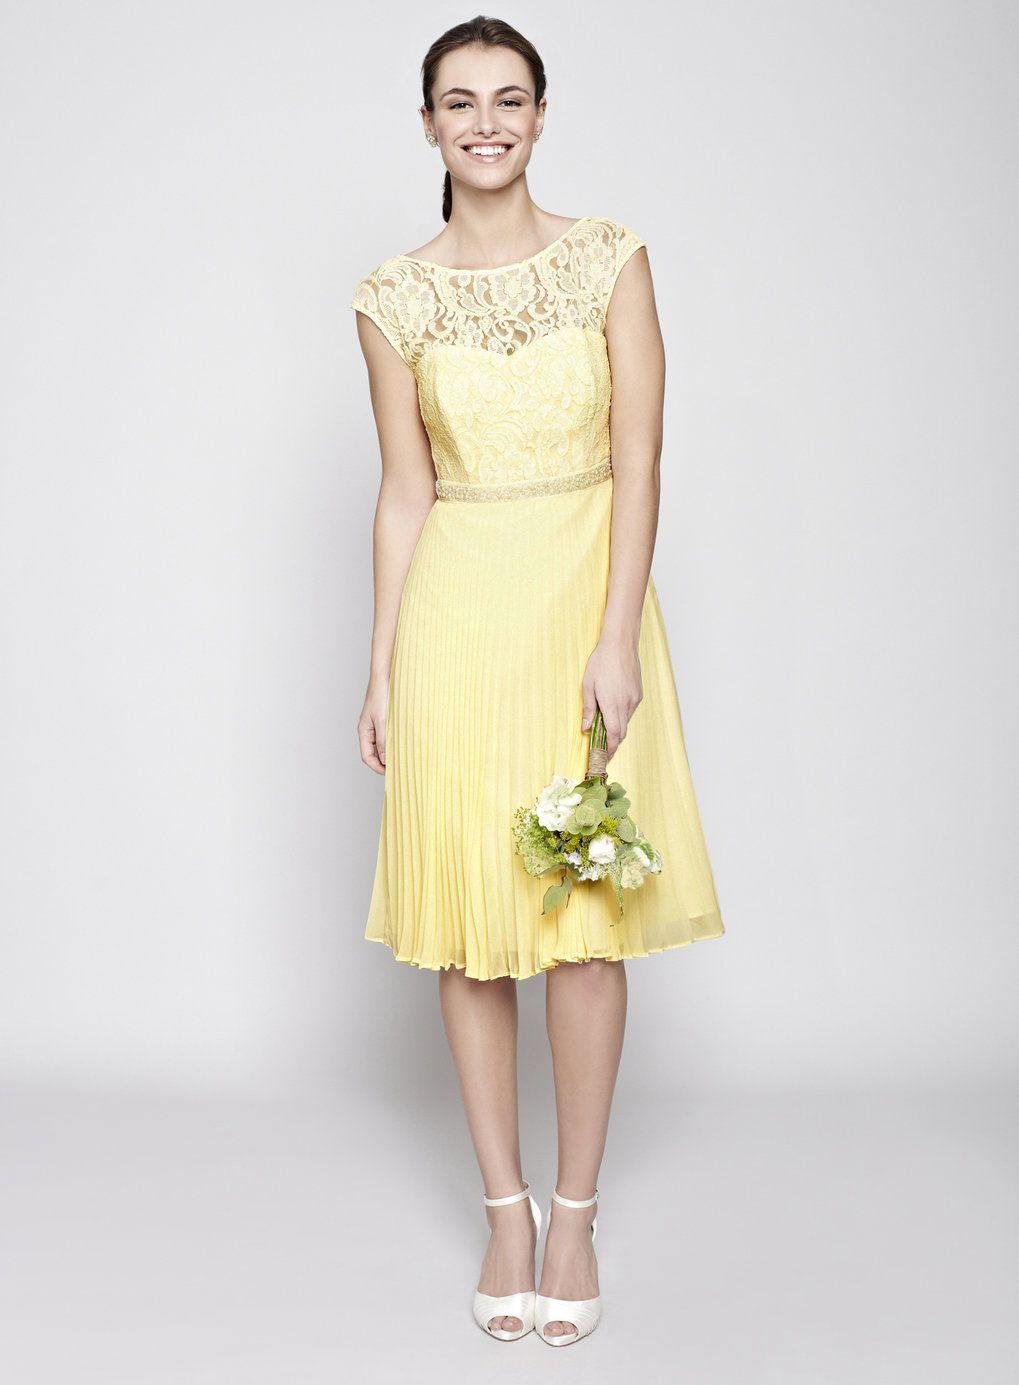 Lemon wedding dress google search yellow bridesmaids dresse